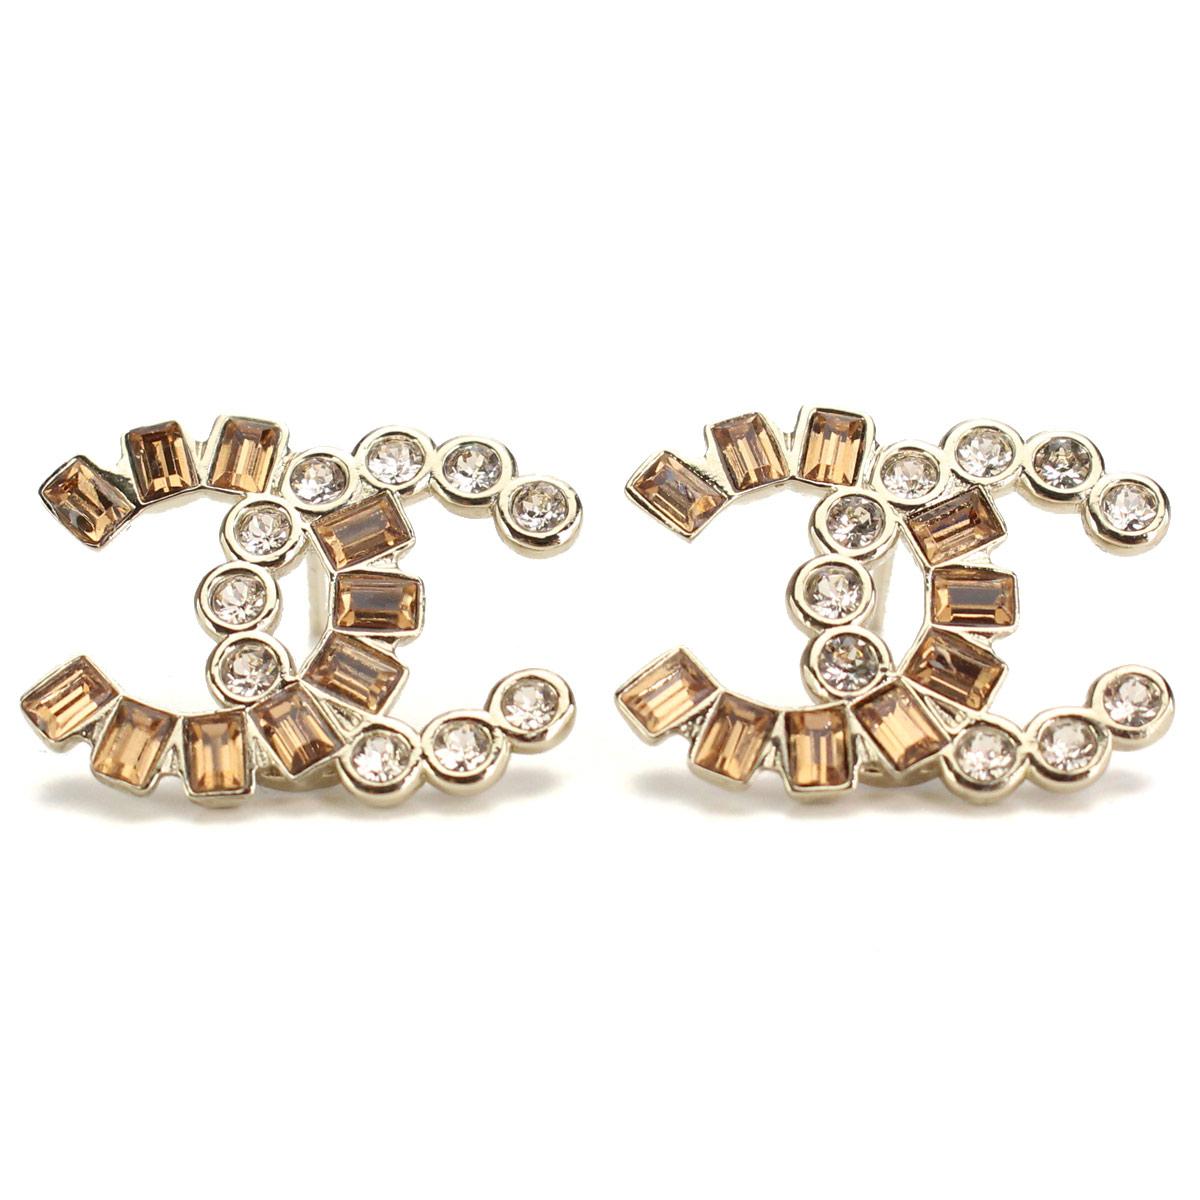 Hit The Total Brand Whole Chanel Rhinestone Here Mark Pierced Earrings A96734 Gold Zirconia Br ジルコ Rakuten Global Market